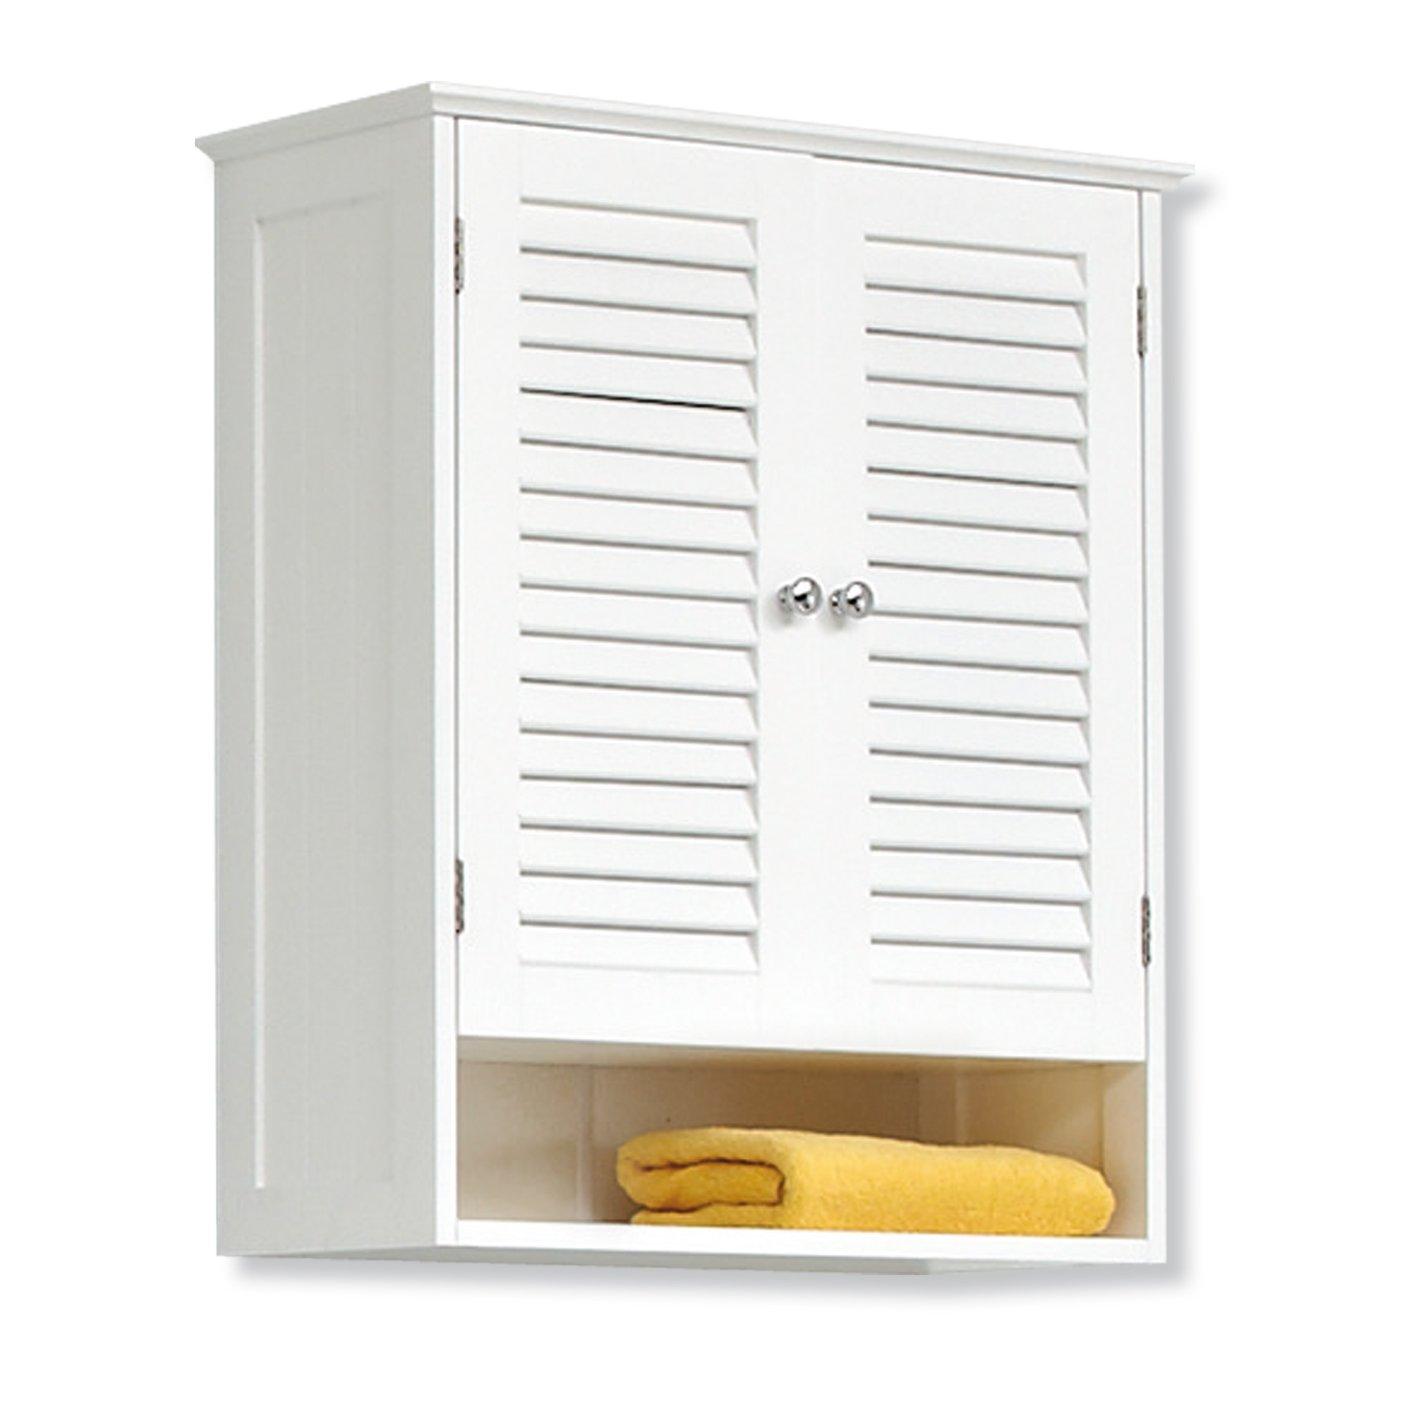 Wandschrank jasper badezimmer h ngeschr nke badm bel badezimmer wohnbereiche m belhaus - Roller badezimmer ...